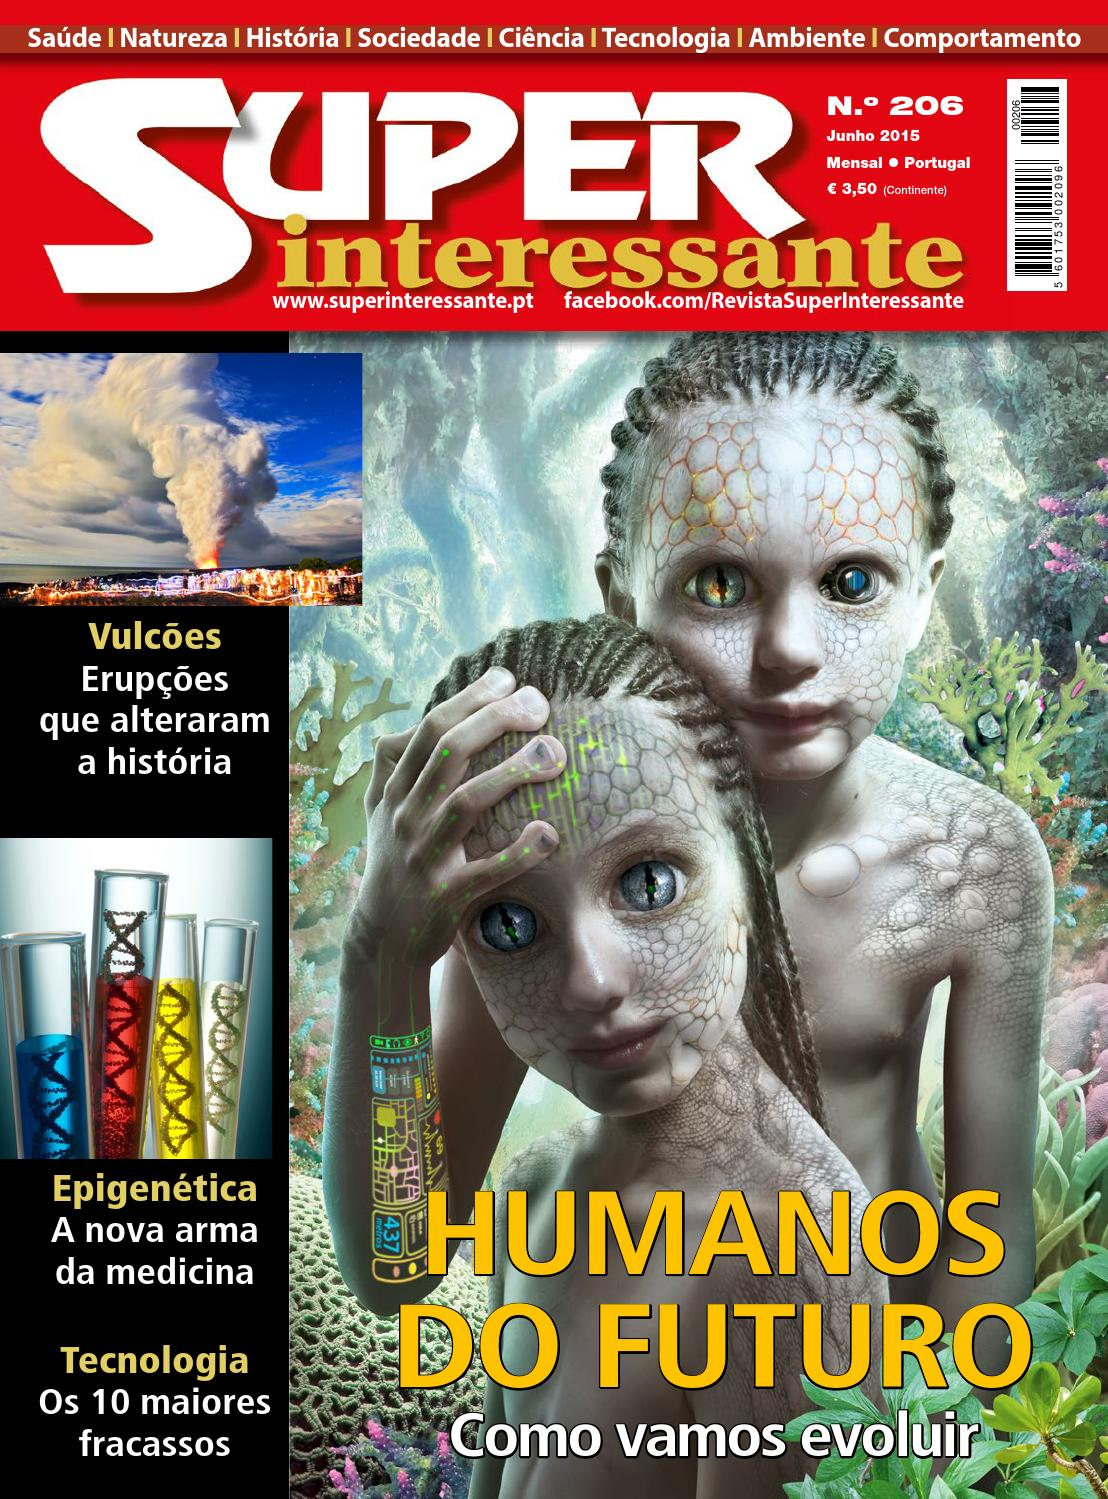 fbd6a936933b5 Super interessante portugal nº 206 by José Reis - issuu